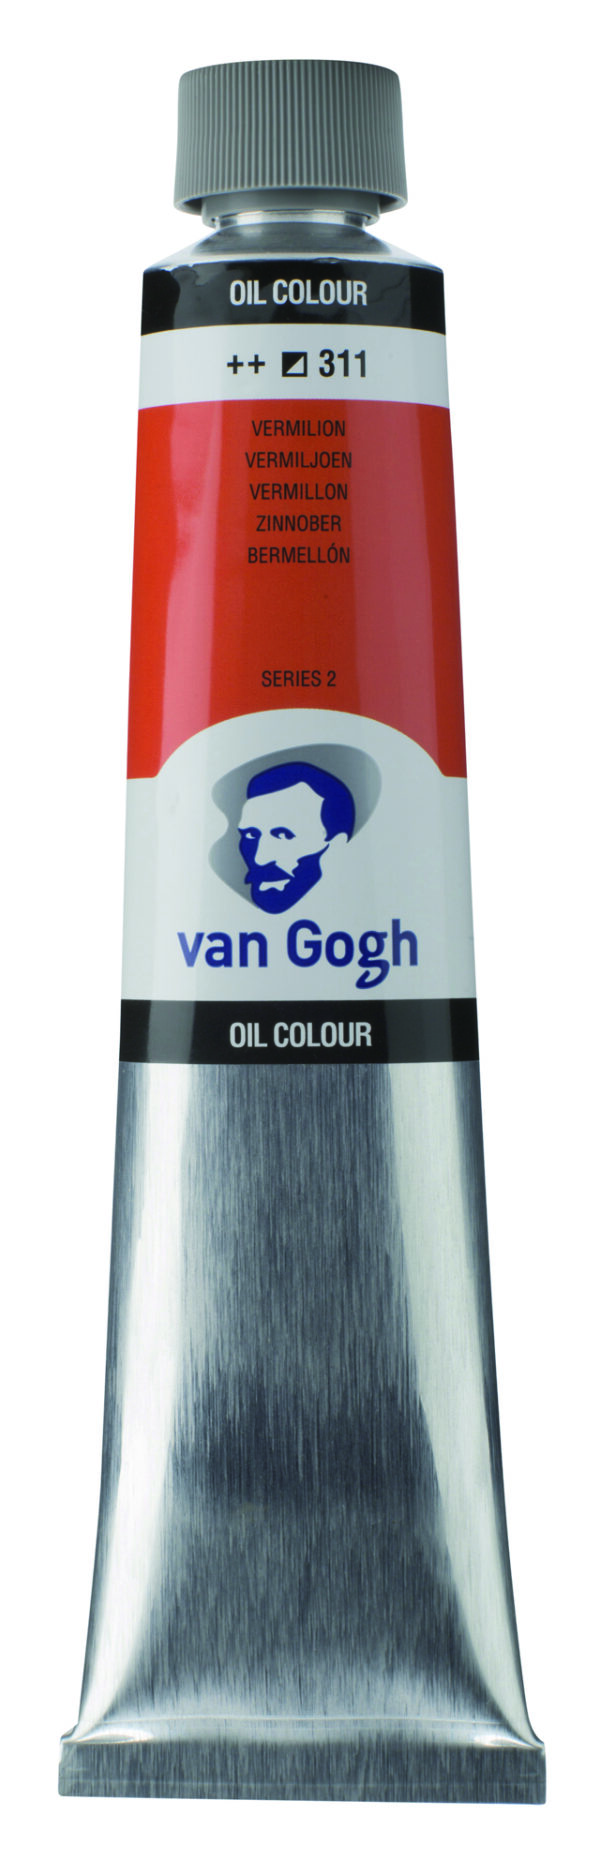 Van Gogh 311 Vermillon - 200 ml